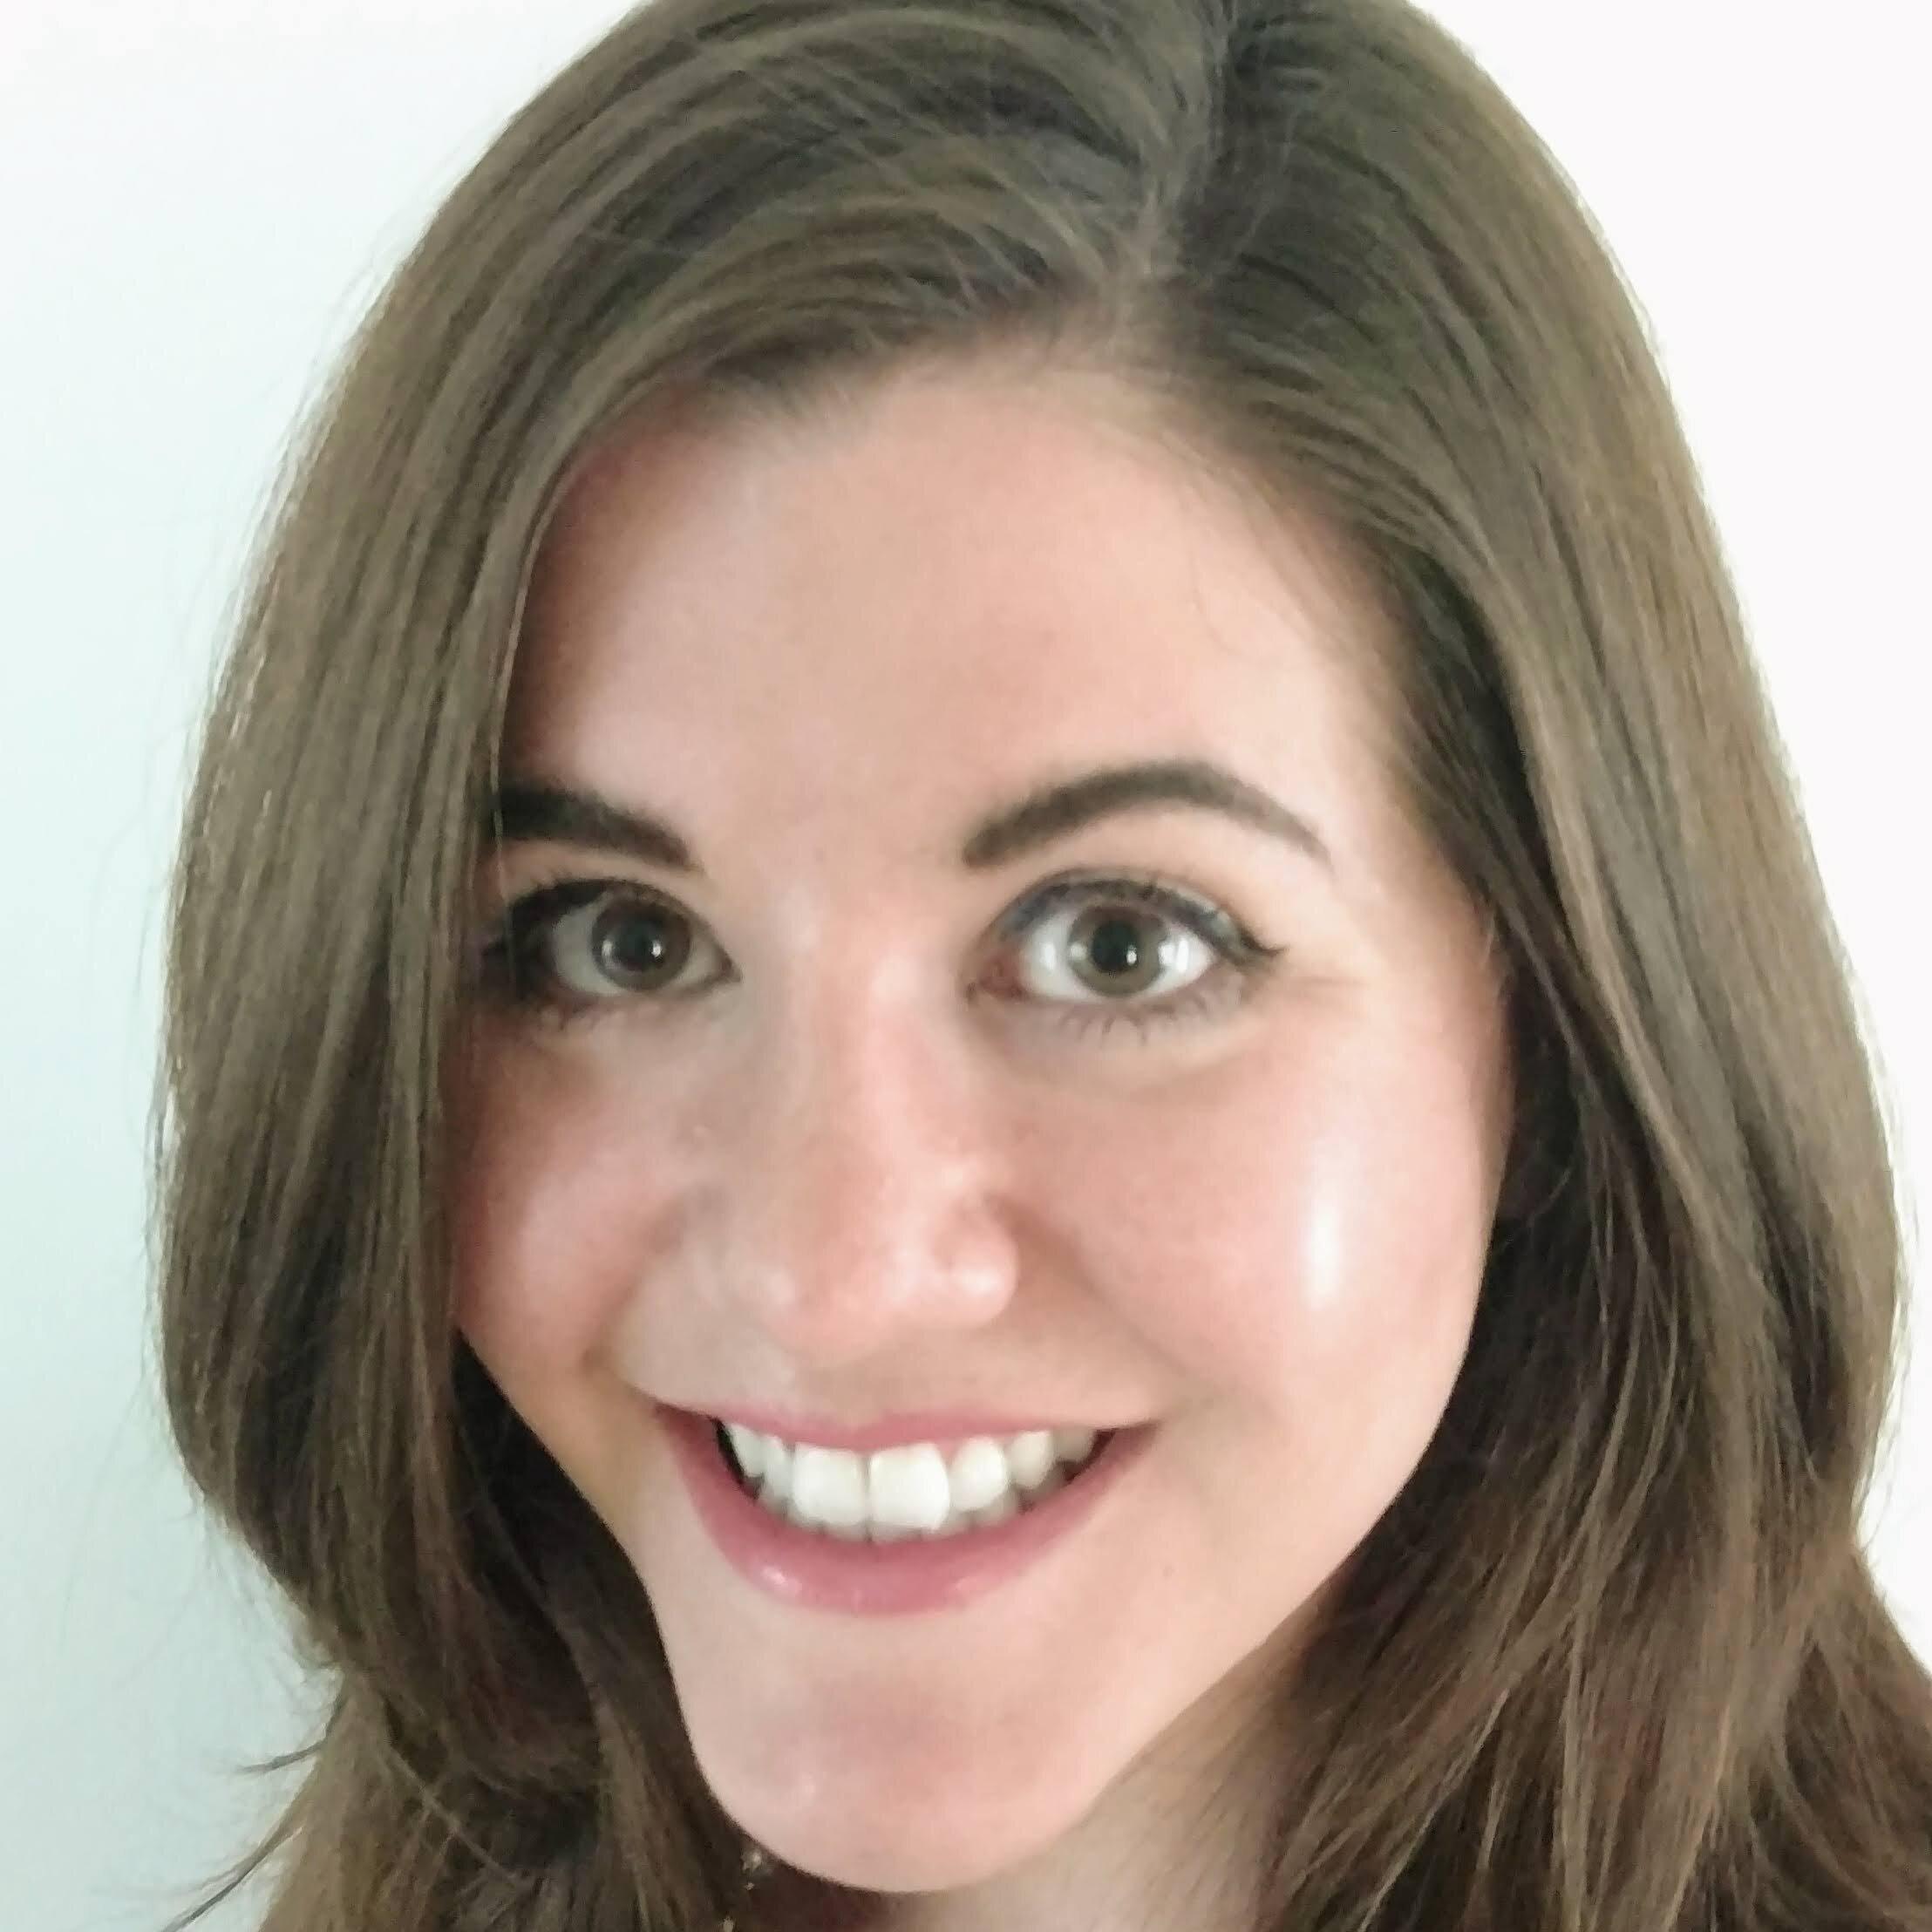 Profile Pic - Megan Cullins (1).jpg